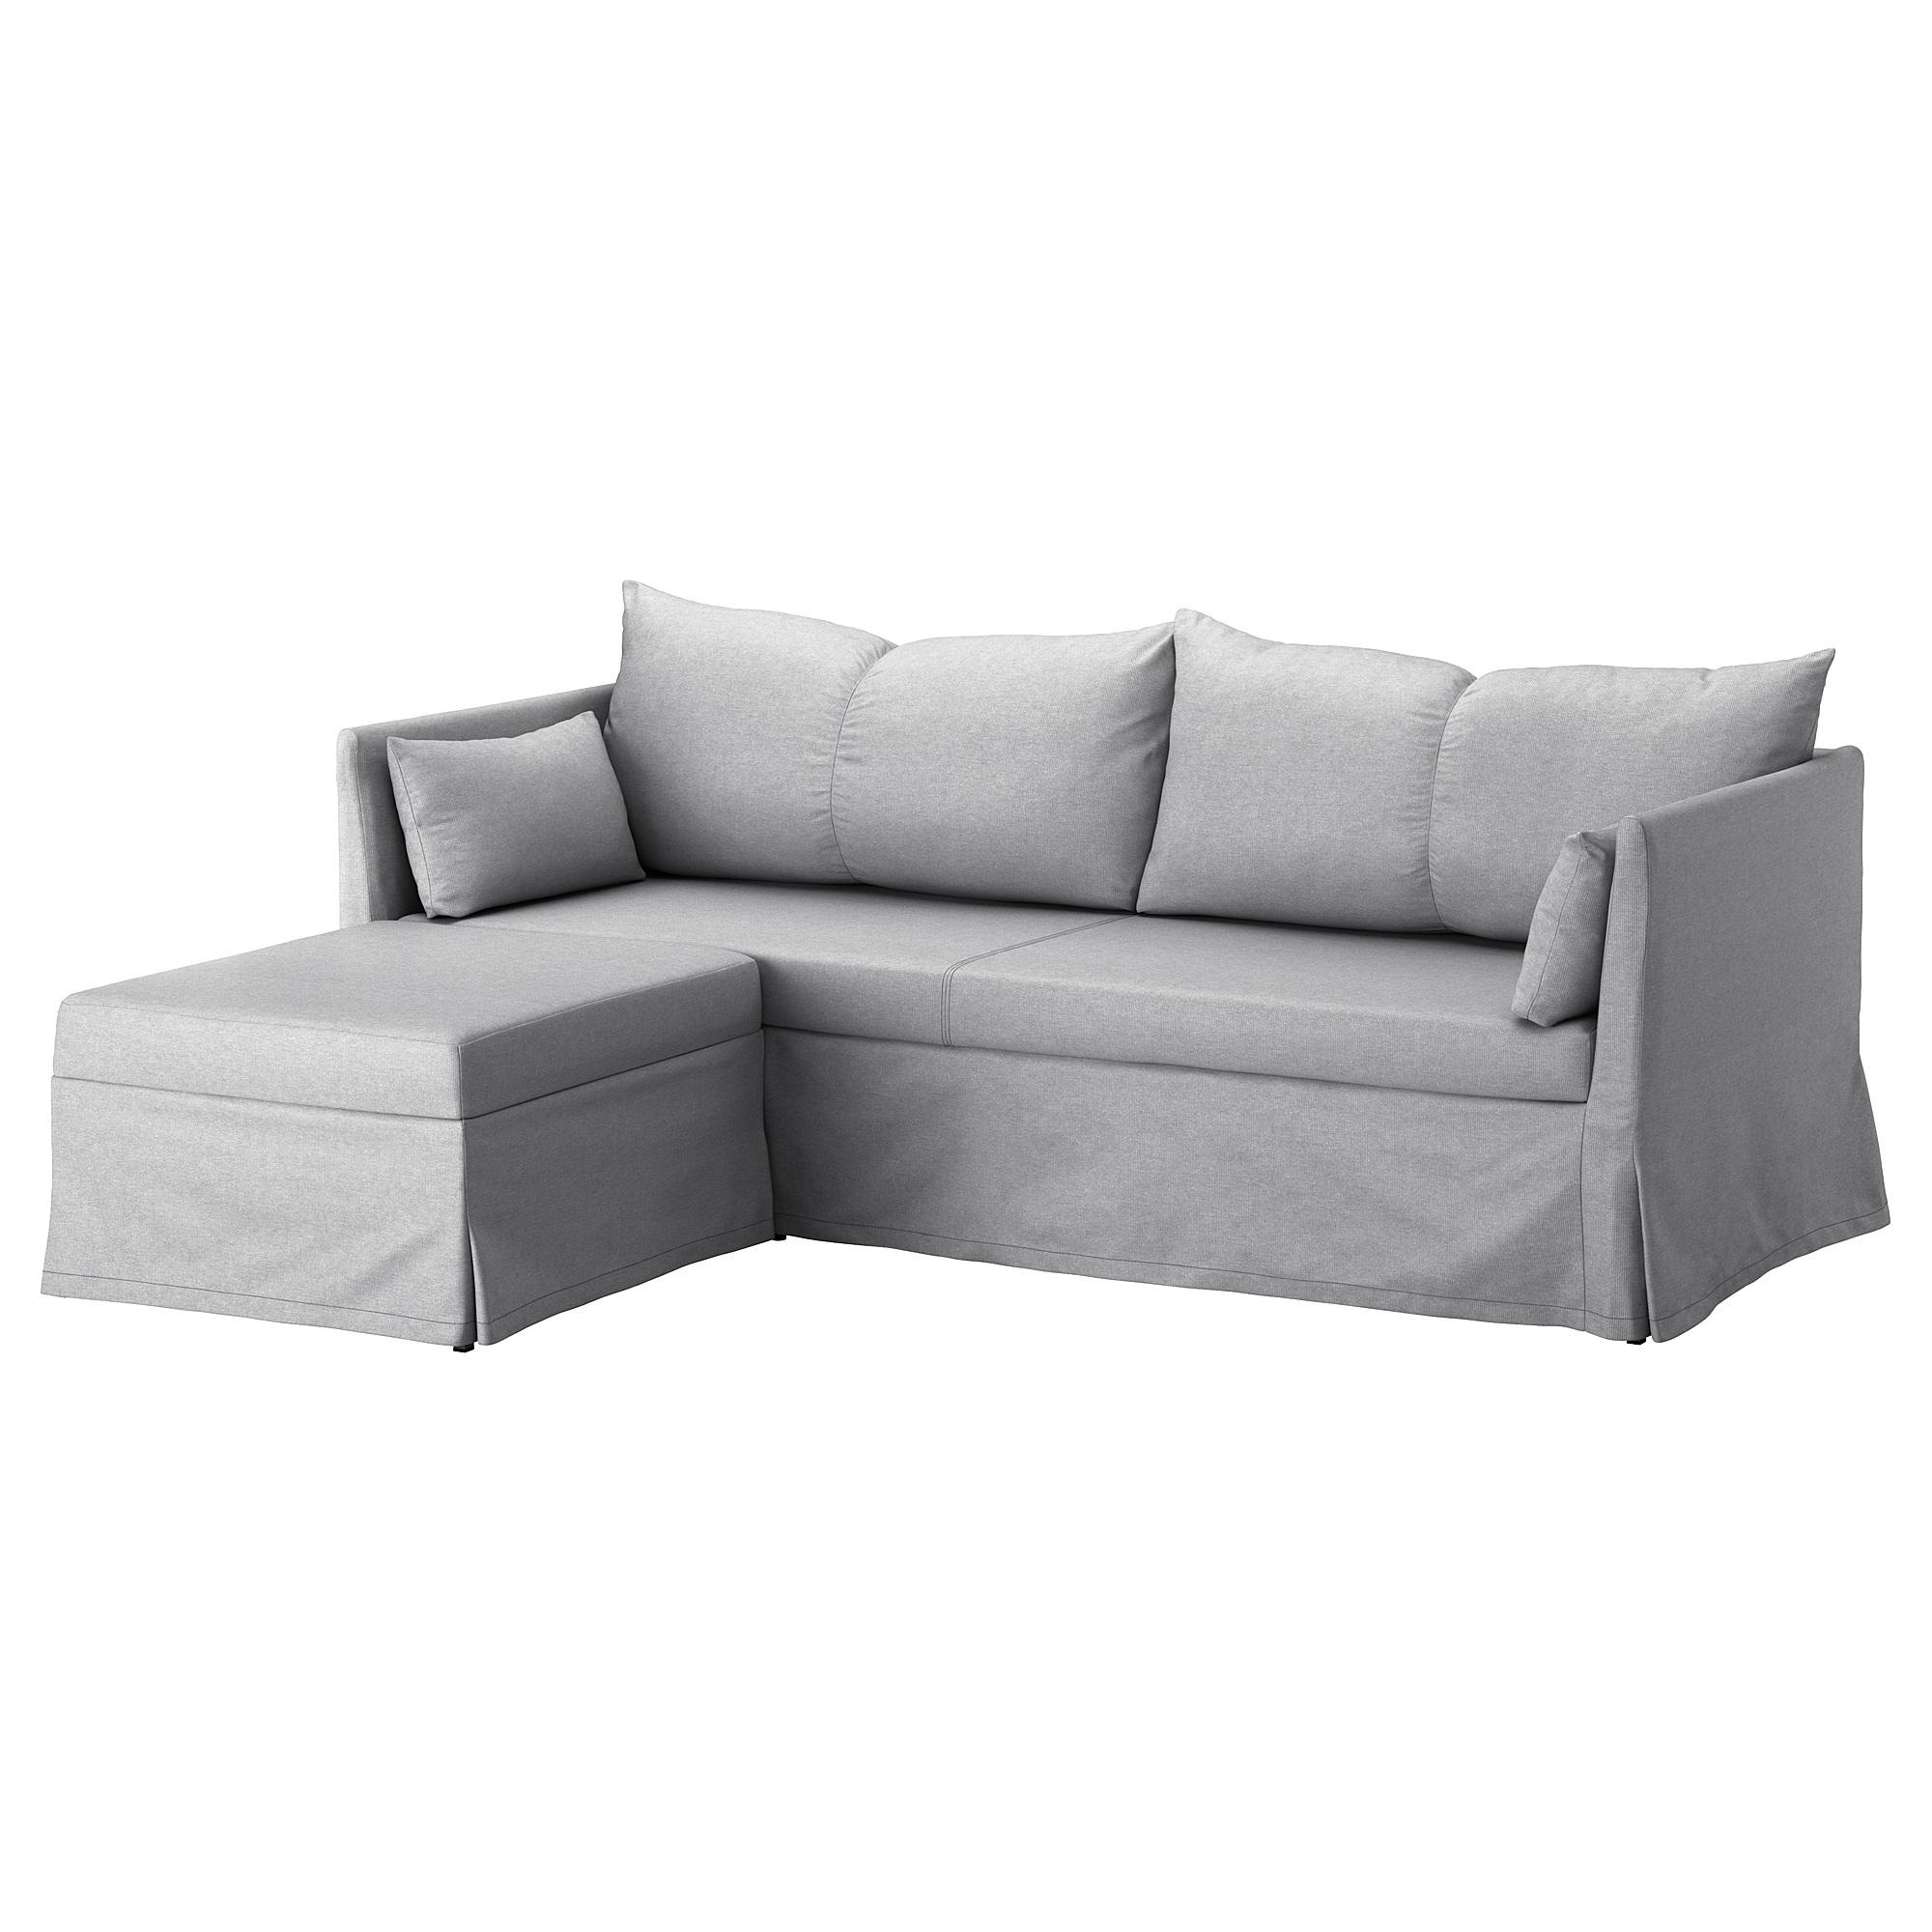 Espuma Seca Para Limpiar Sofas Best Free Trendy Limpieza De  ~ Limpiar Sofa De Tela Trucos Caseros